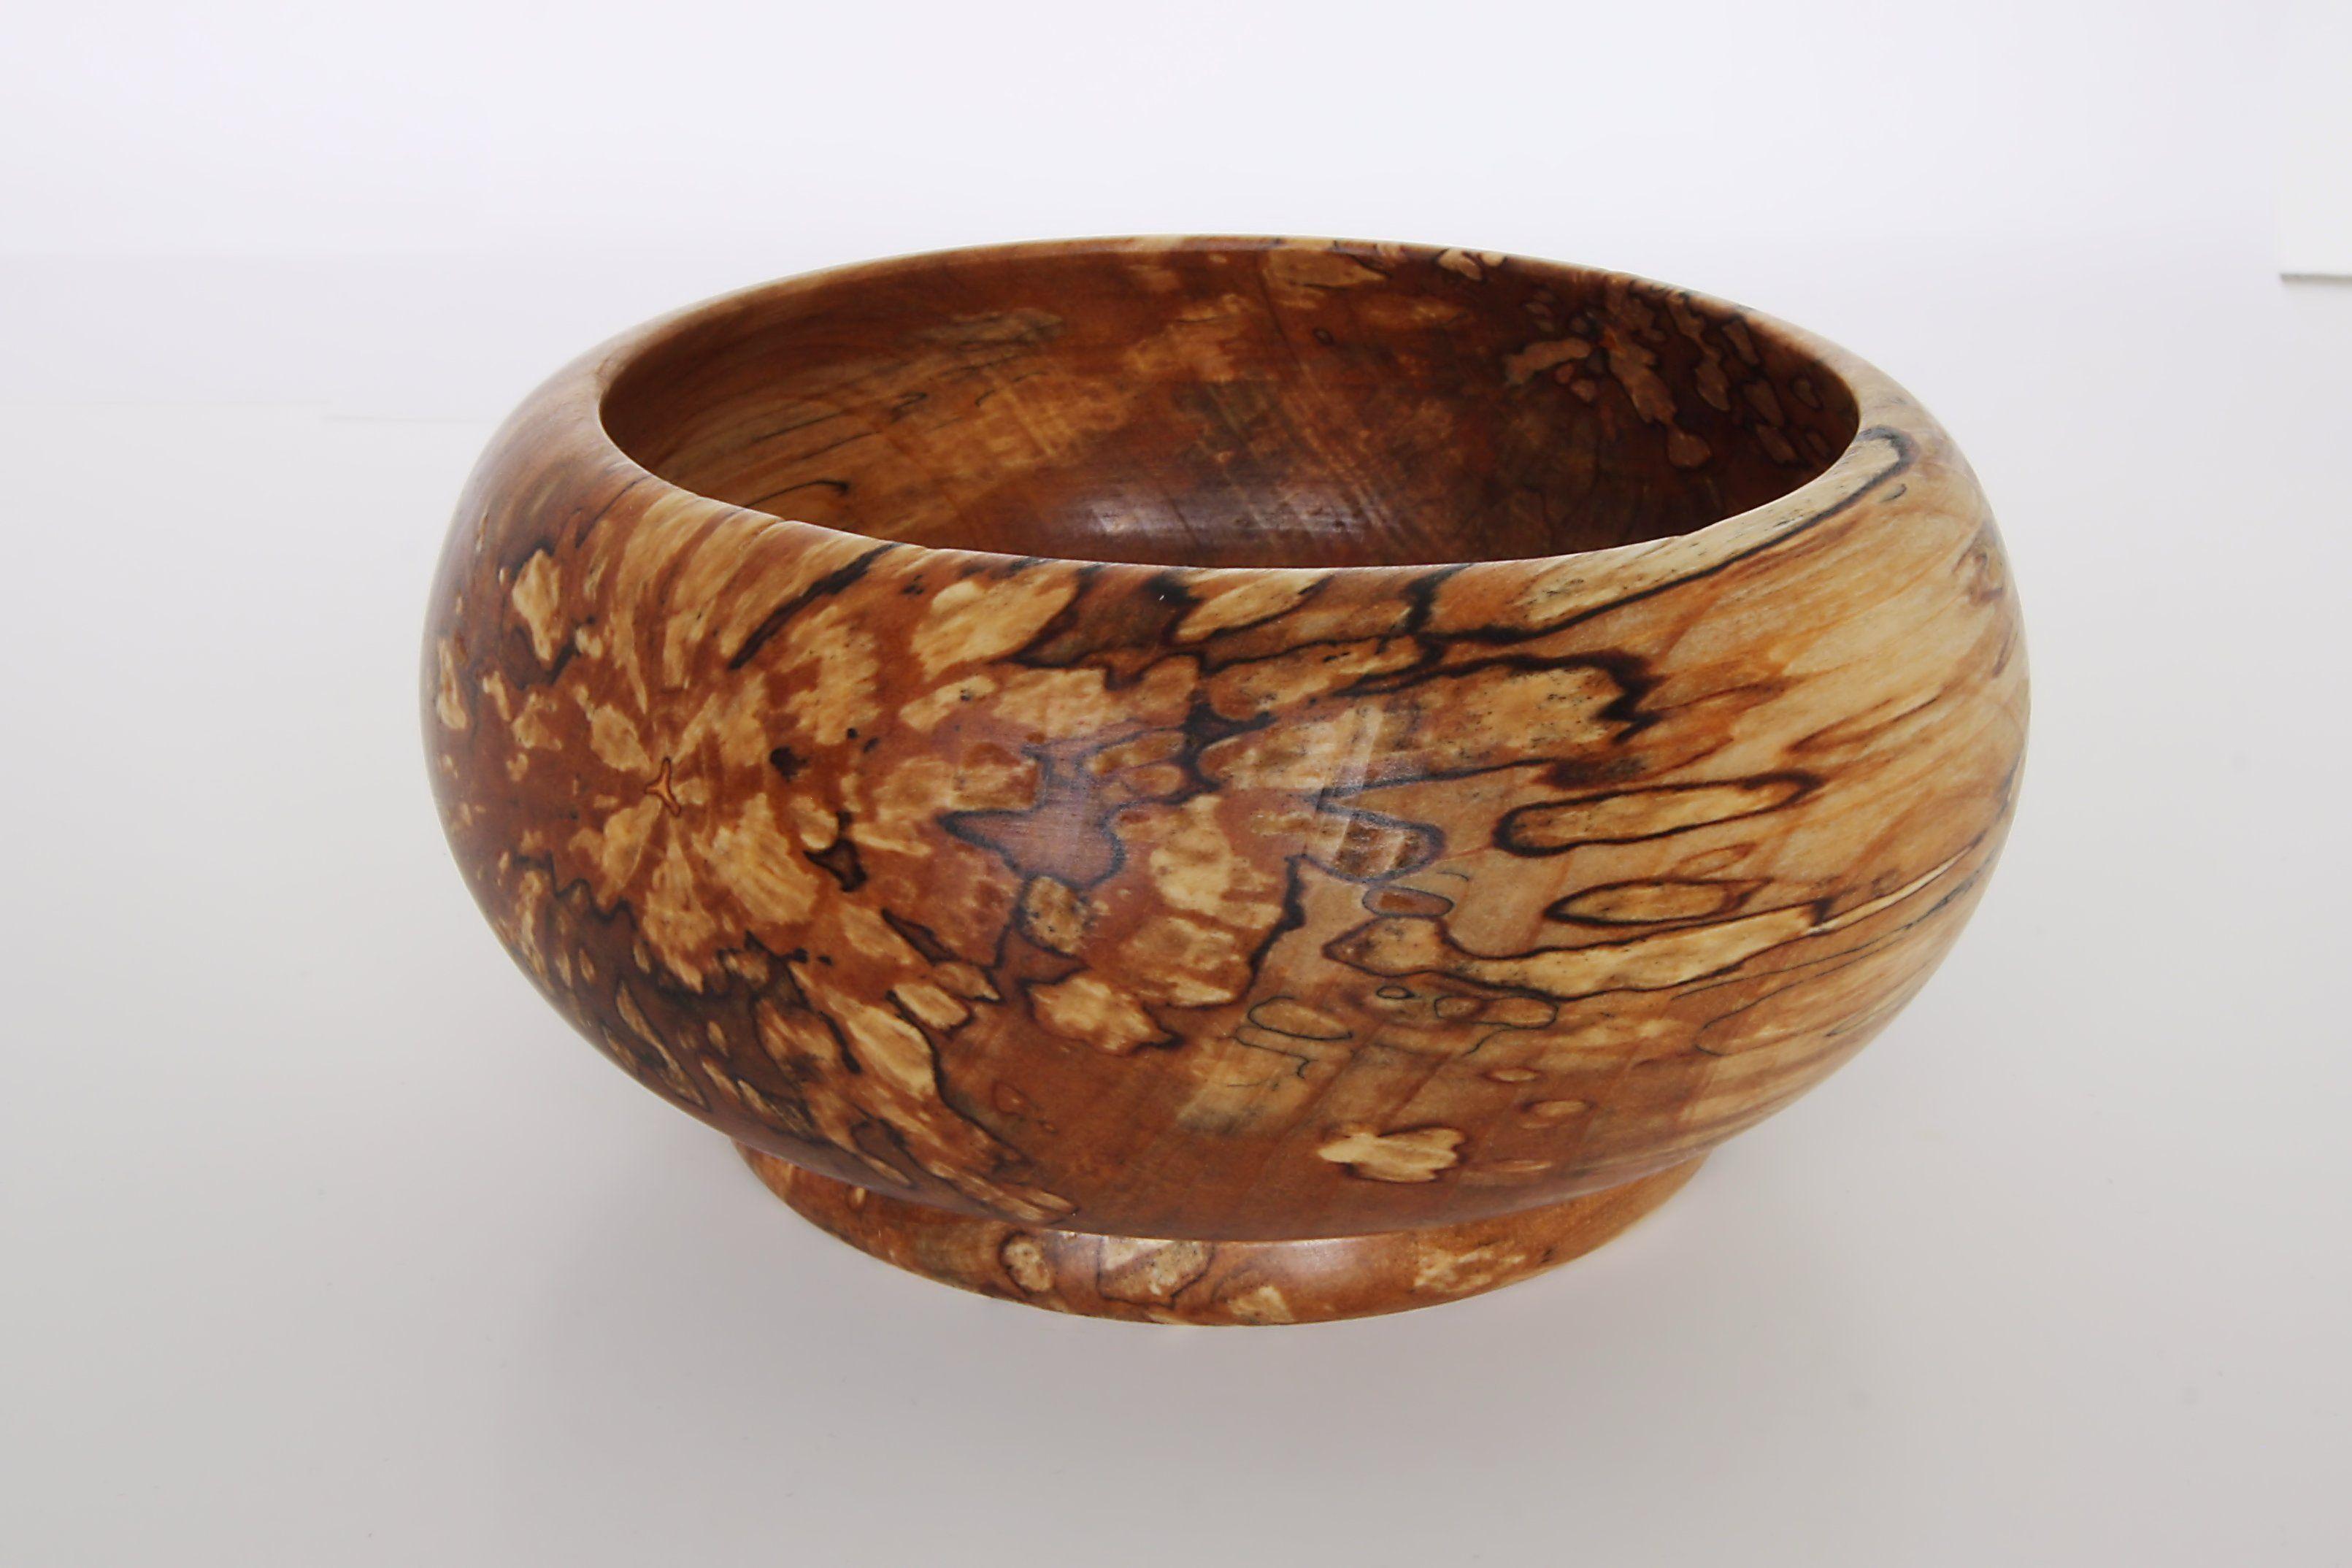 15 Cm Wood Bowl Wood Spalted Alder Finish 100 Tung Oil Bowl 10